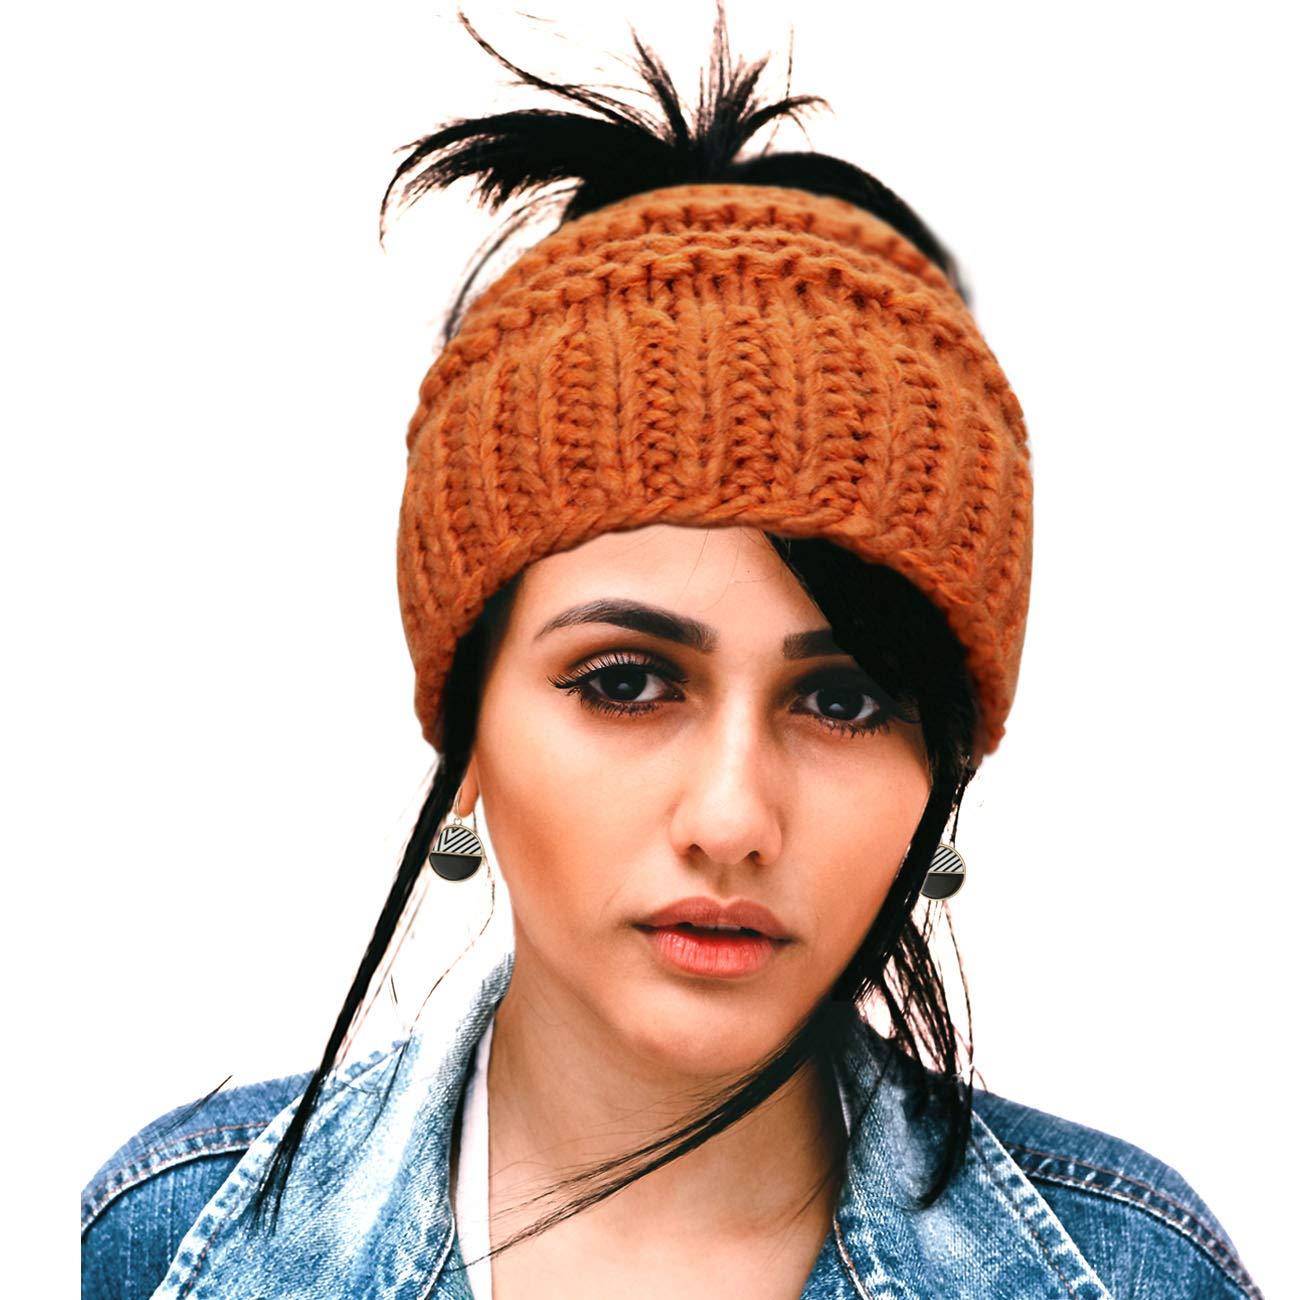 Women s Ponytail Beanies Messy Bun Winter Crochet Knit Beanie Hats  BeanieTail with Ponytail Bun Hole for Women Girls Orange 1a1eae2e5df